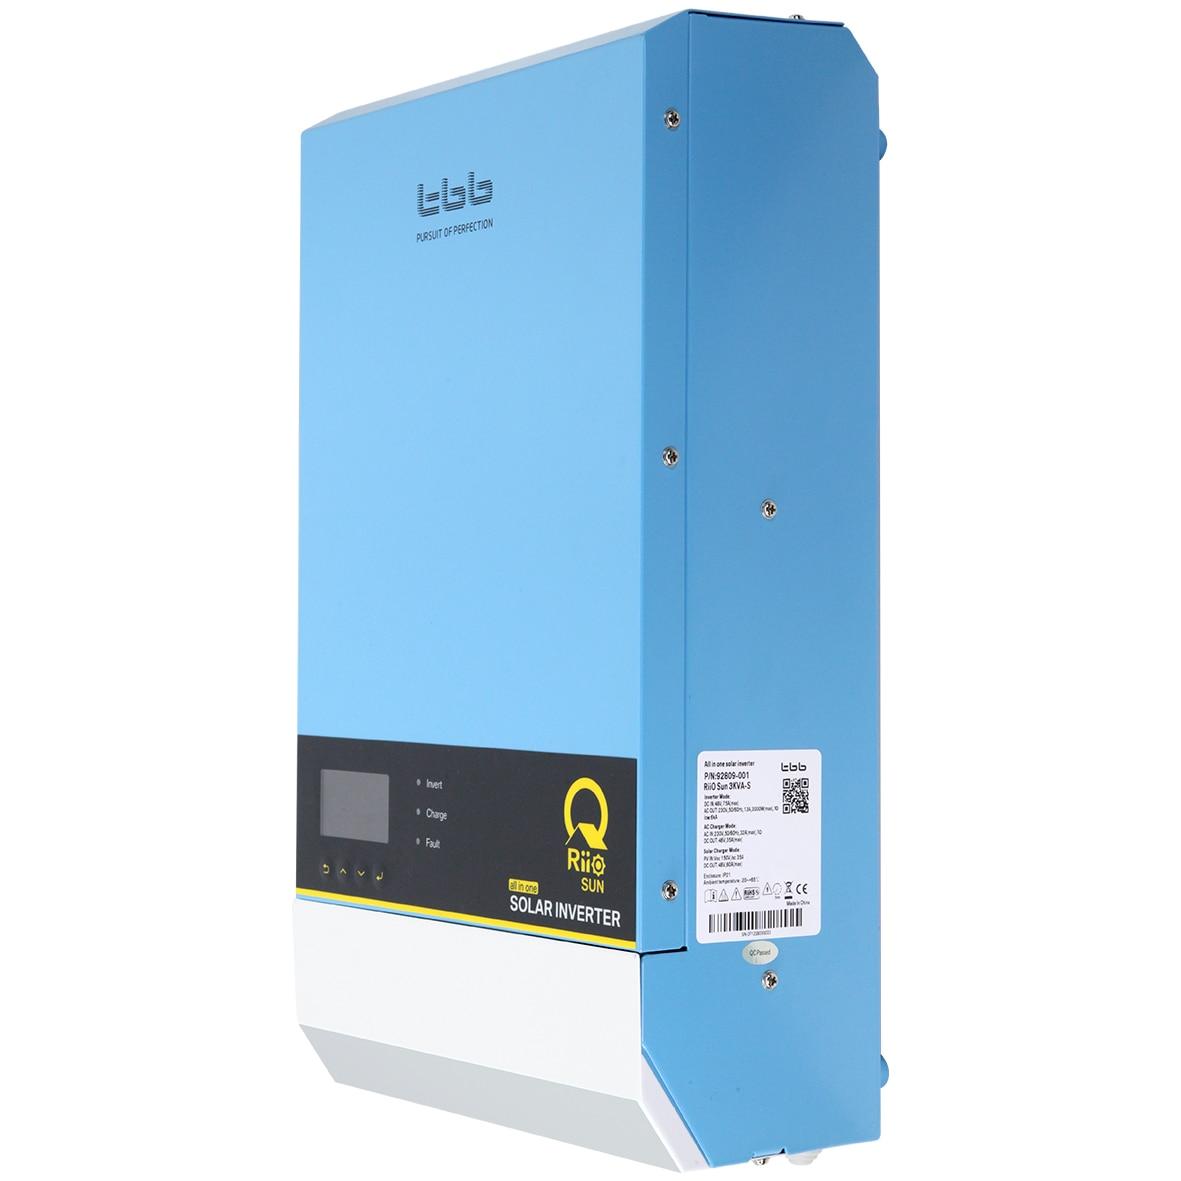 TBB المنزل مخازن نظام الطاقة الحل 3KW الهجين خارج الشبكة الشمسية العاكس